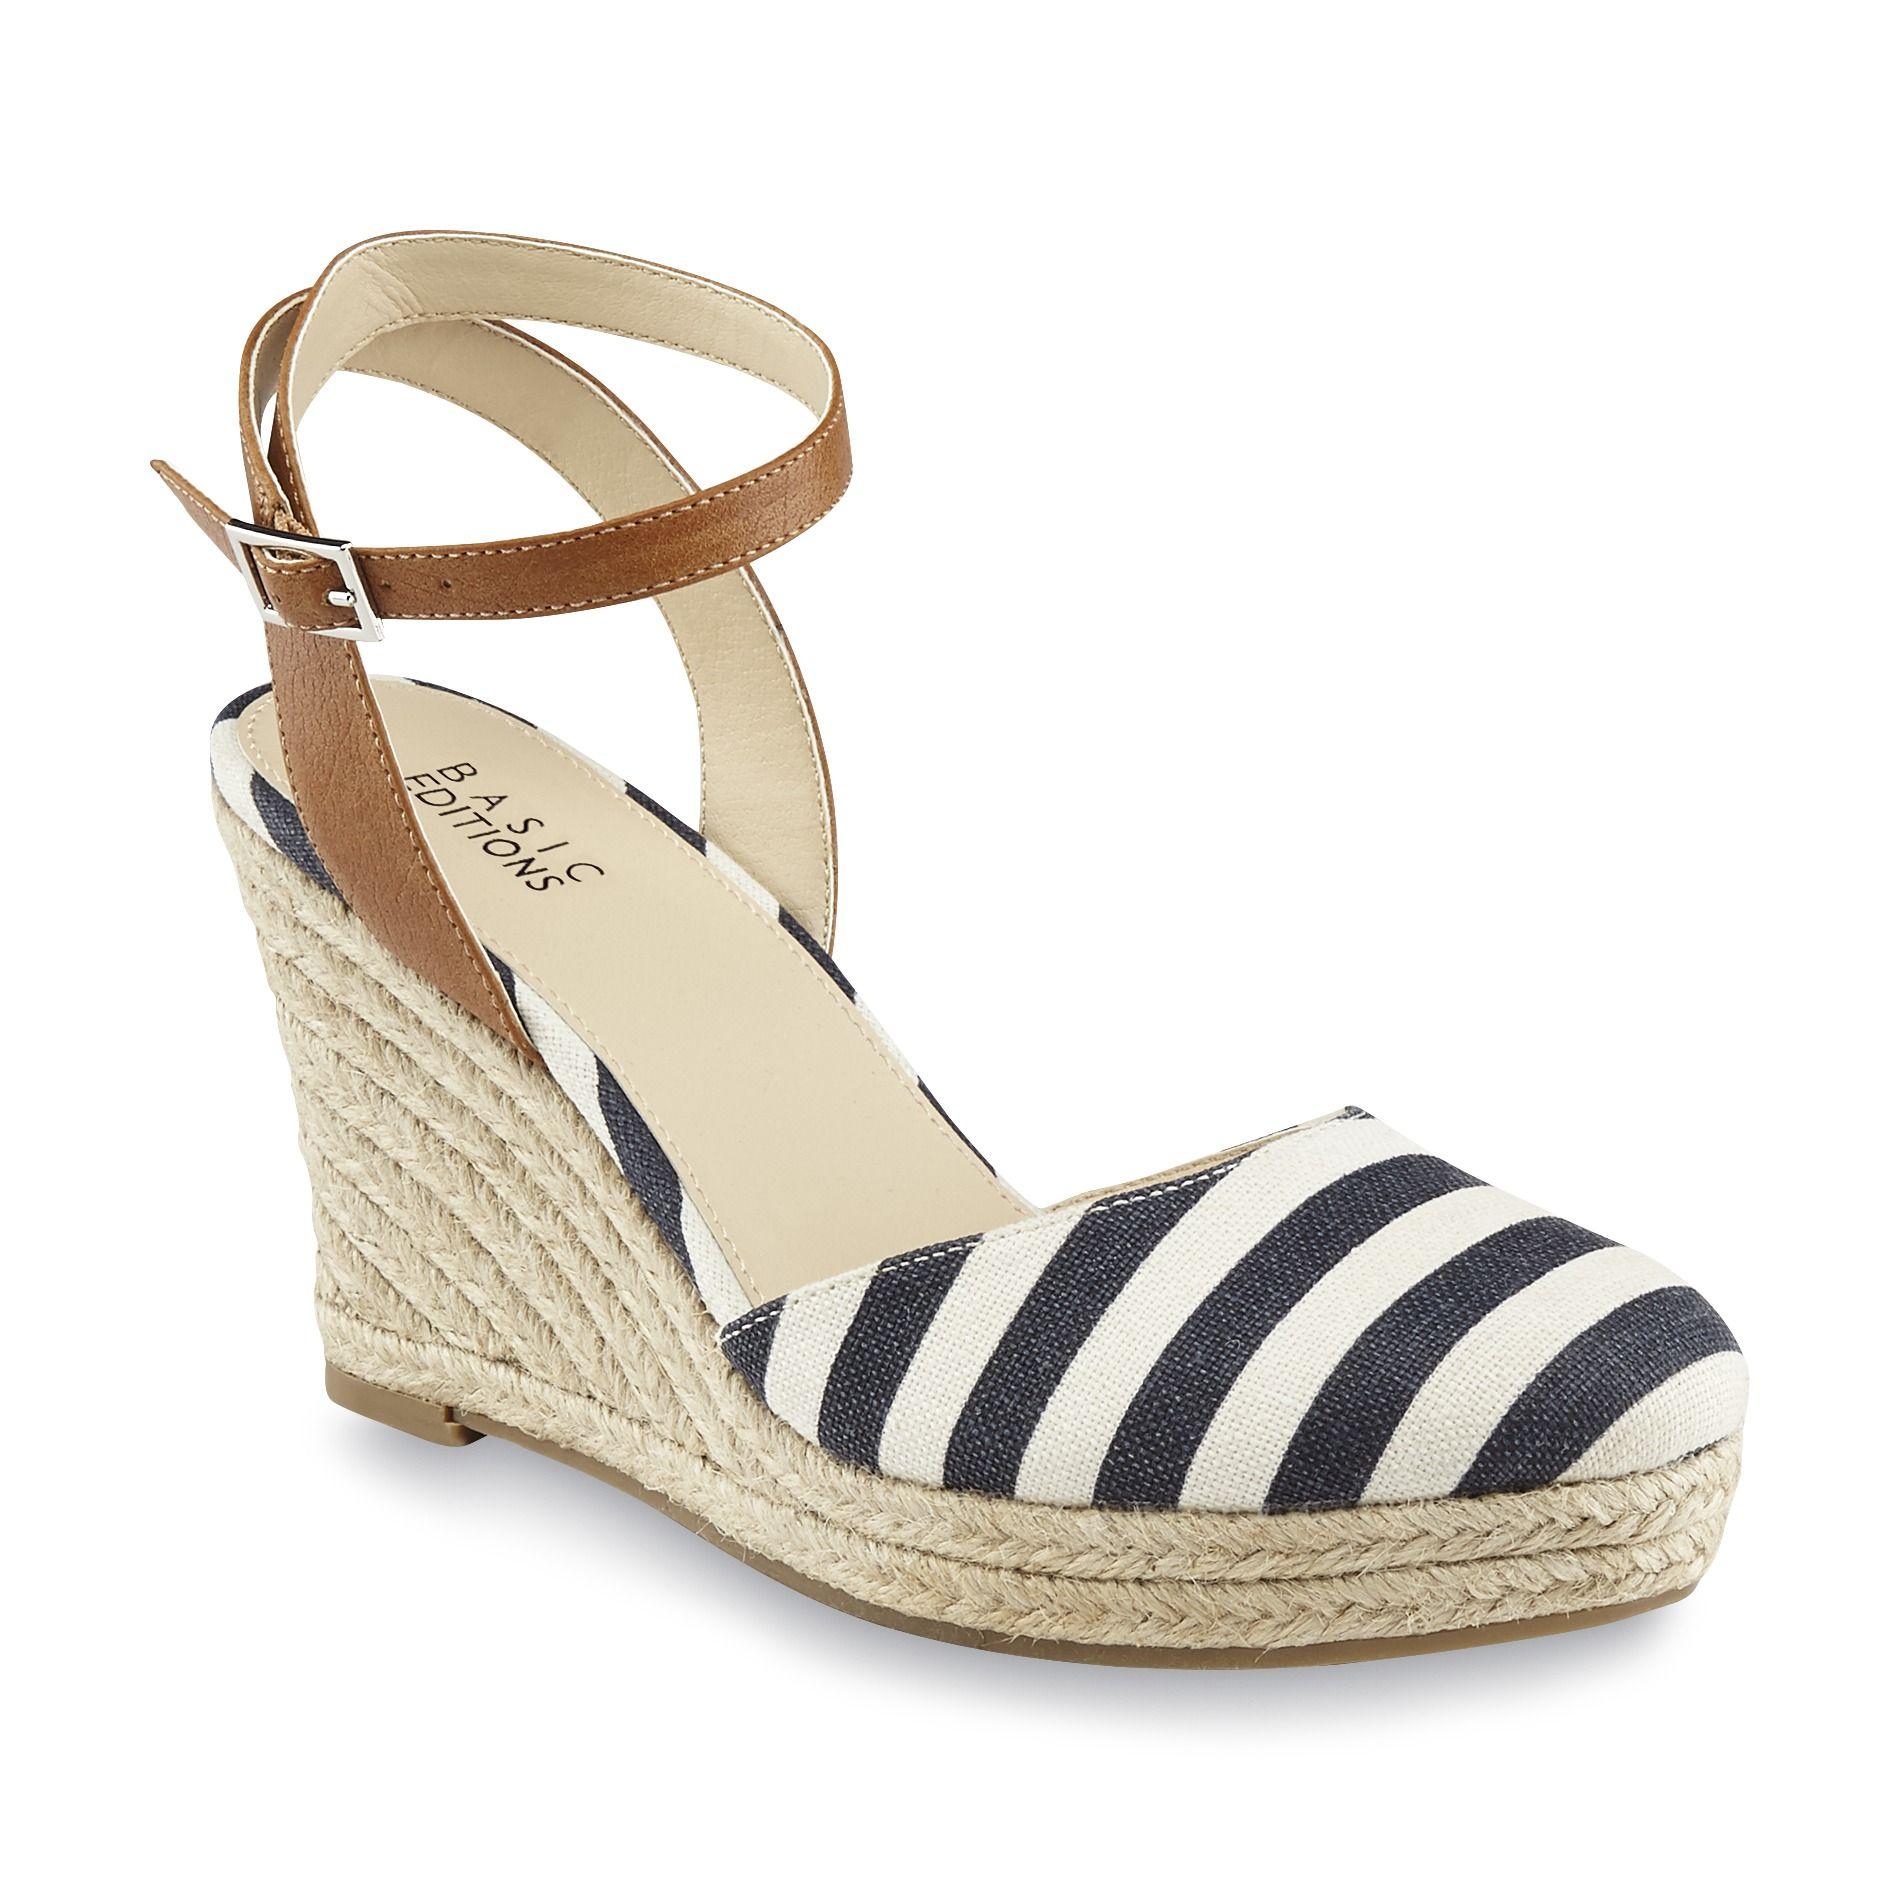 Kmart.com | Tan wedge shoes